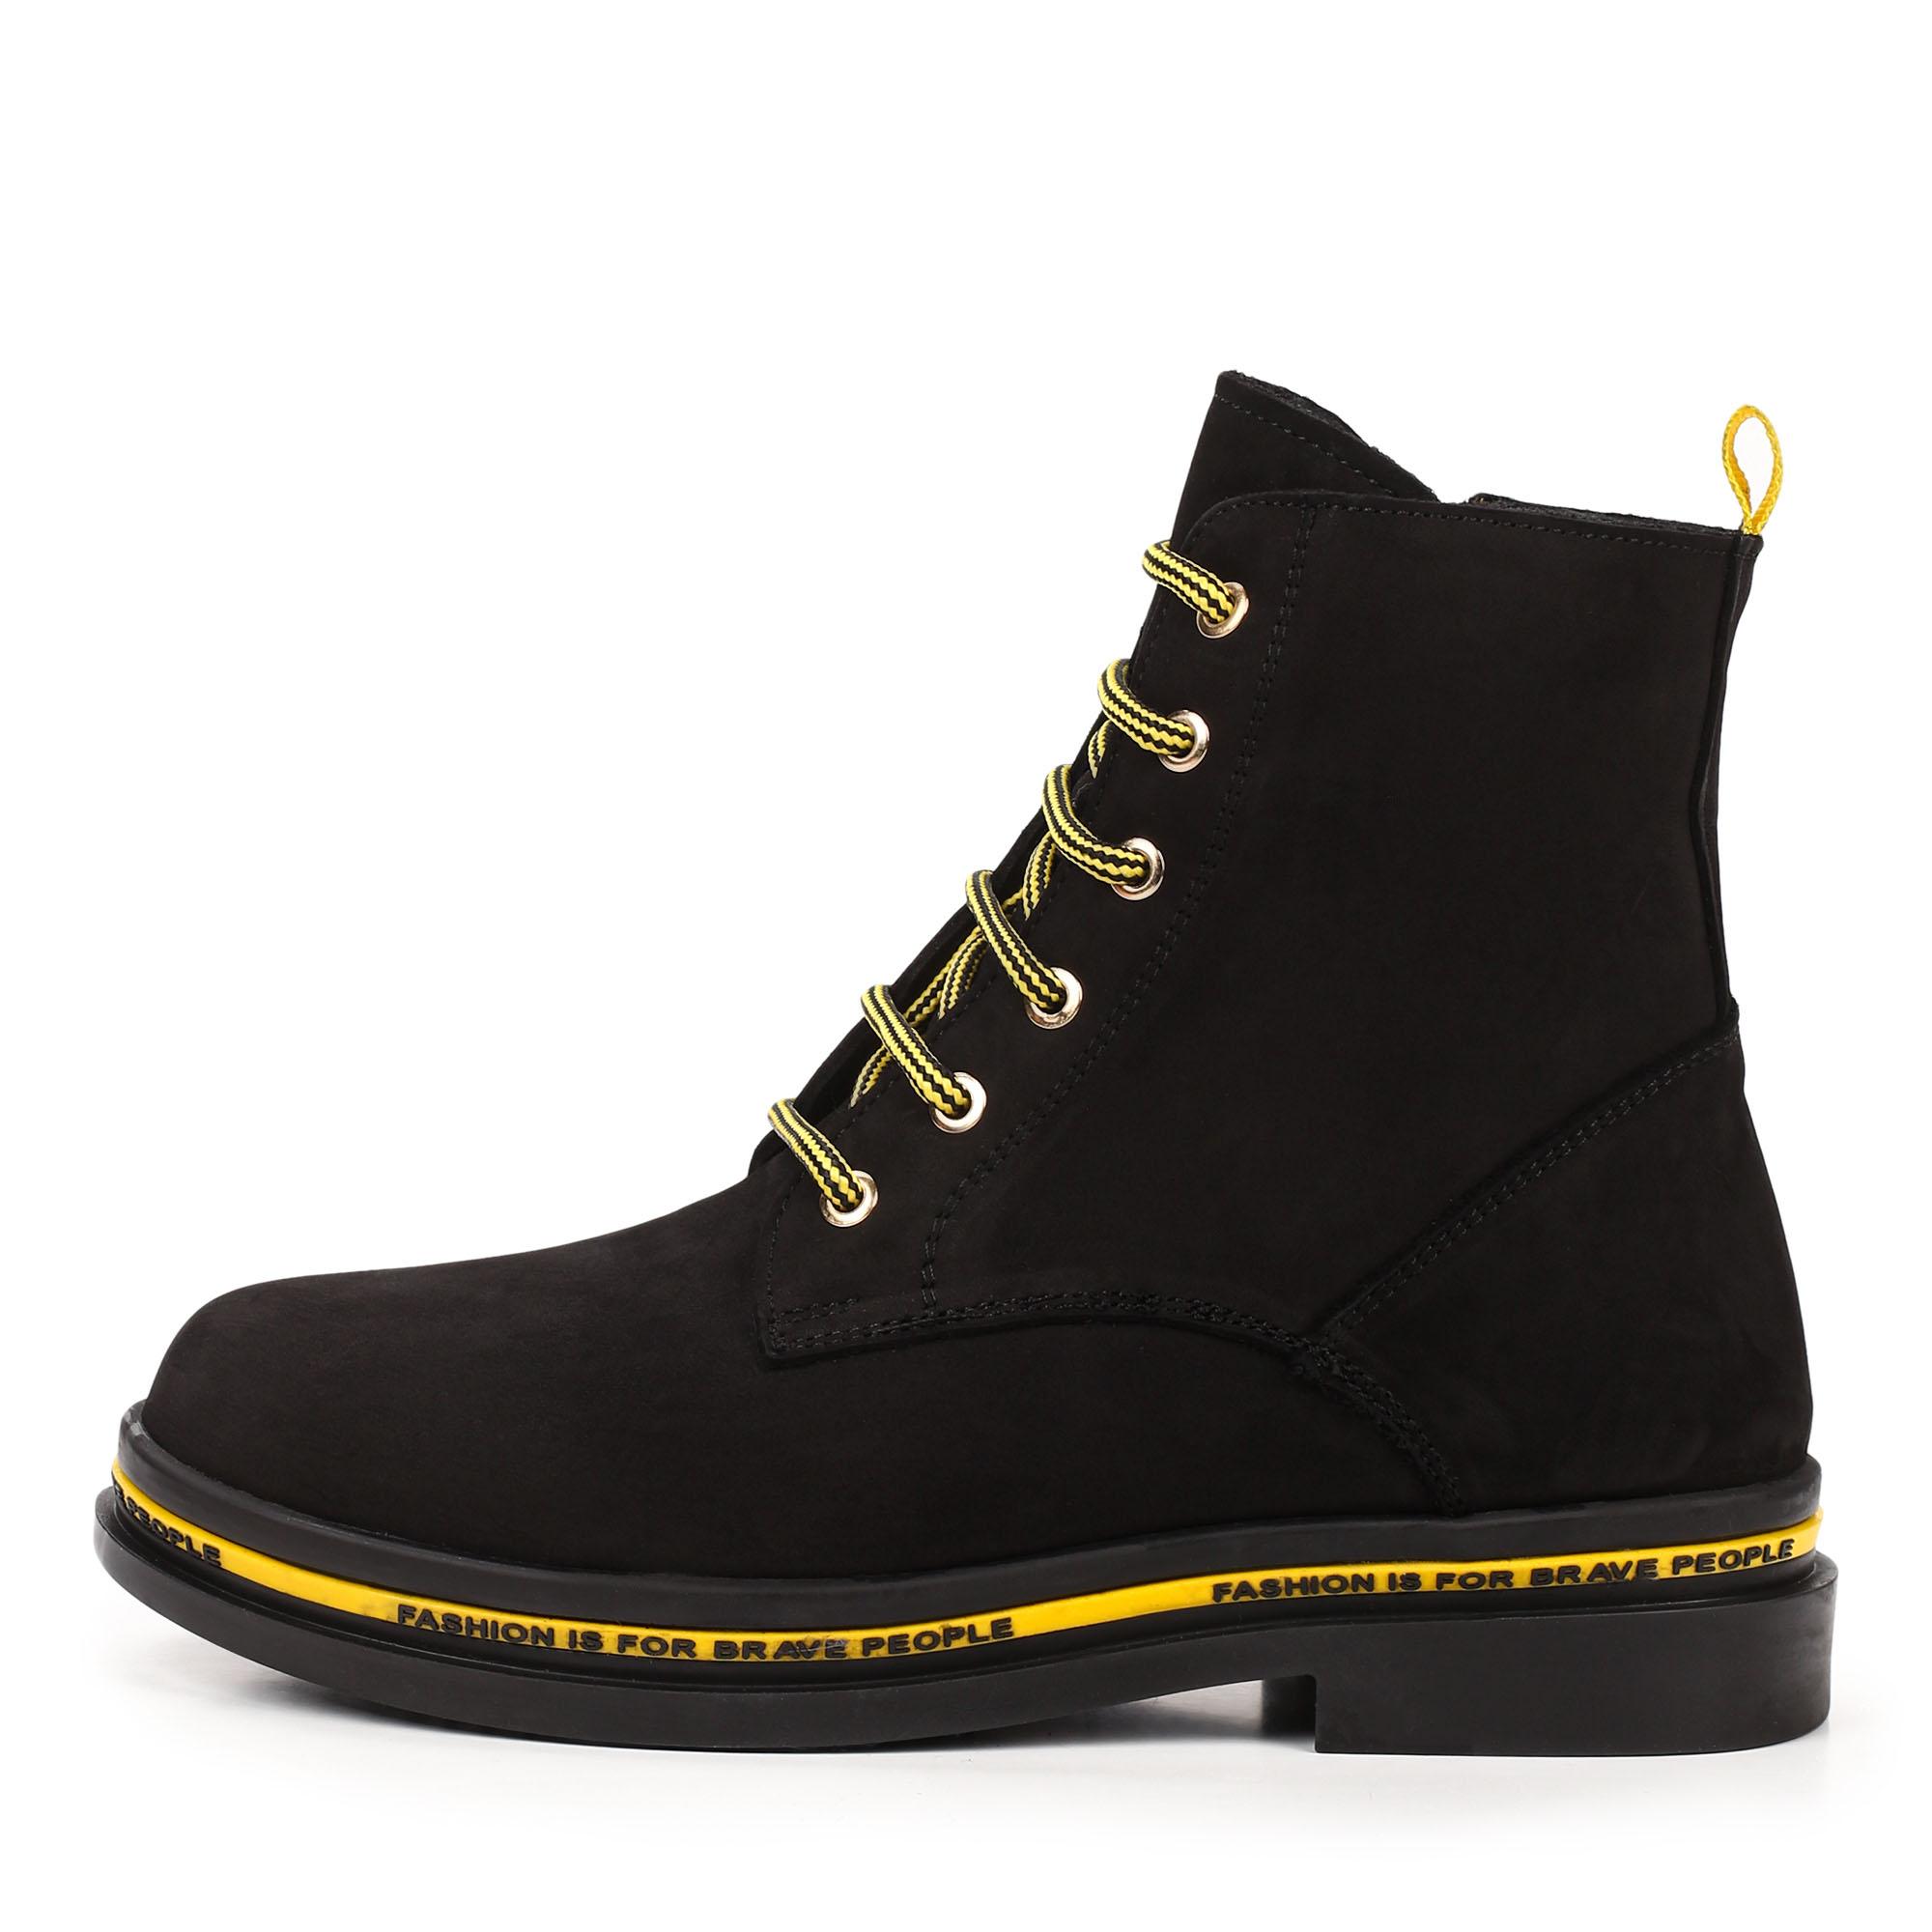 Ботинки Thomas Munz 505-101A-40302